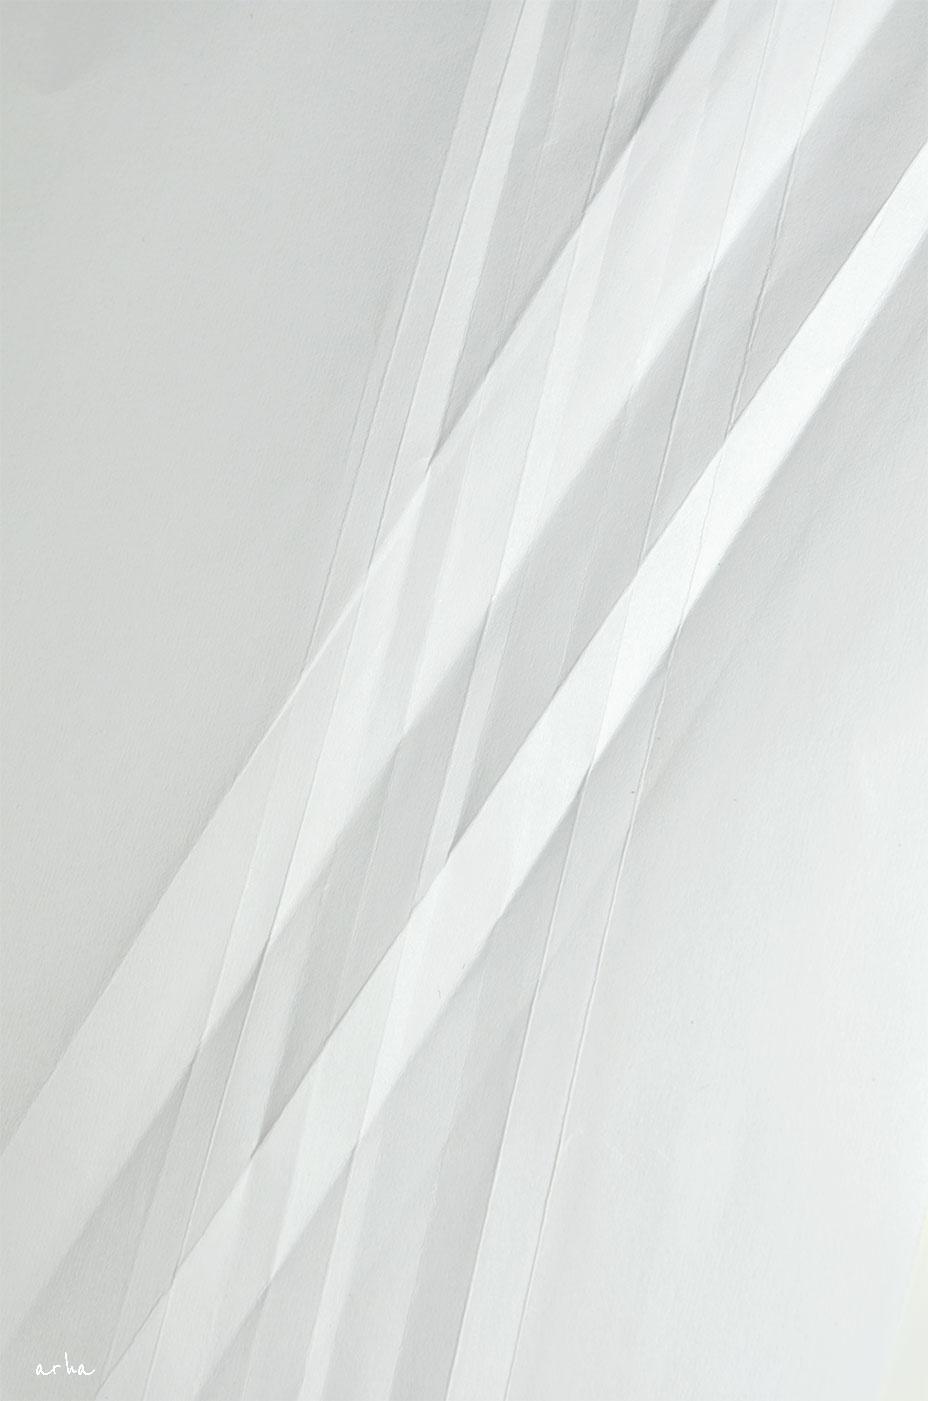 Gem-paper-shakara-copyright-2012-arha-Tomomichi-Morifuji